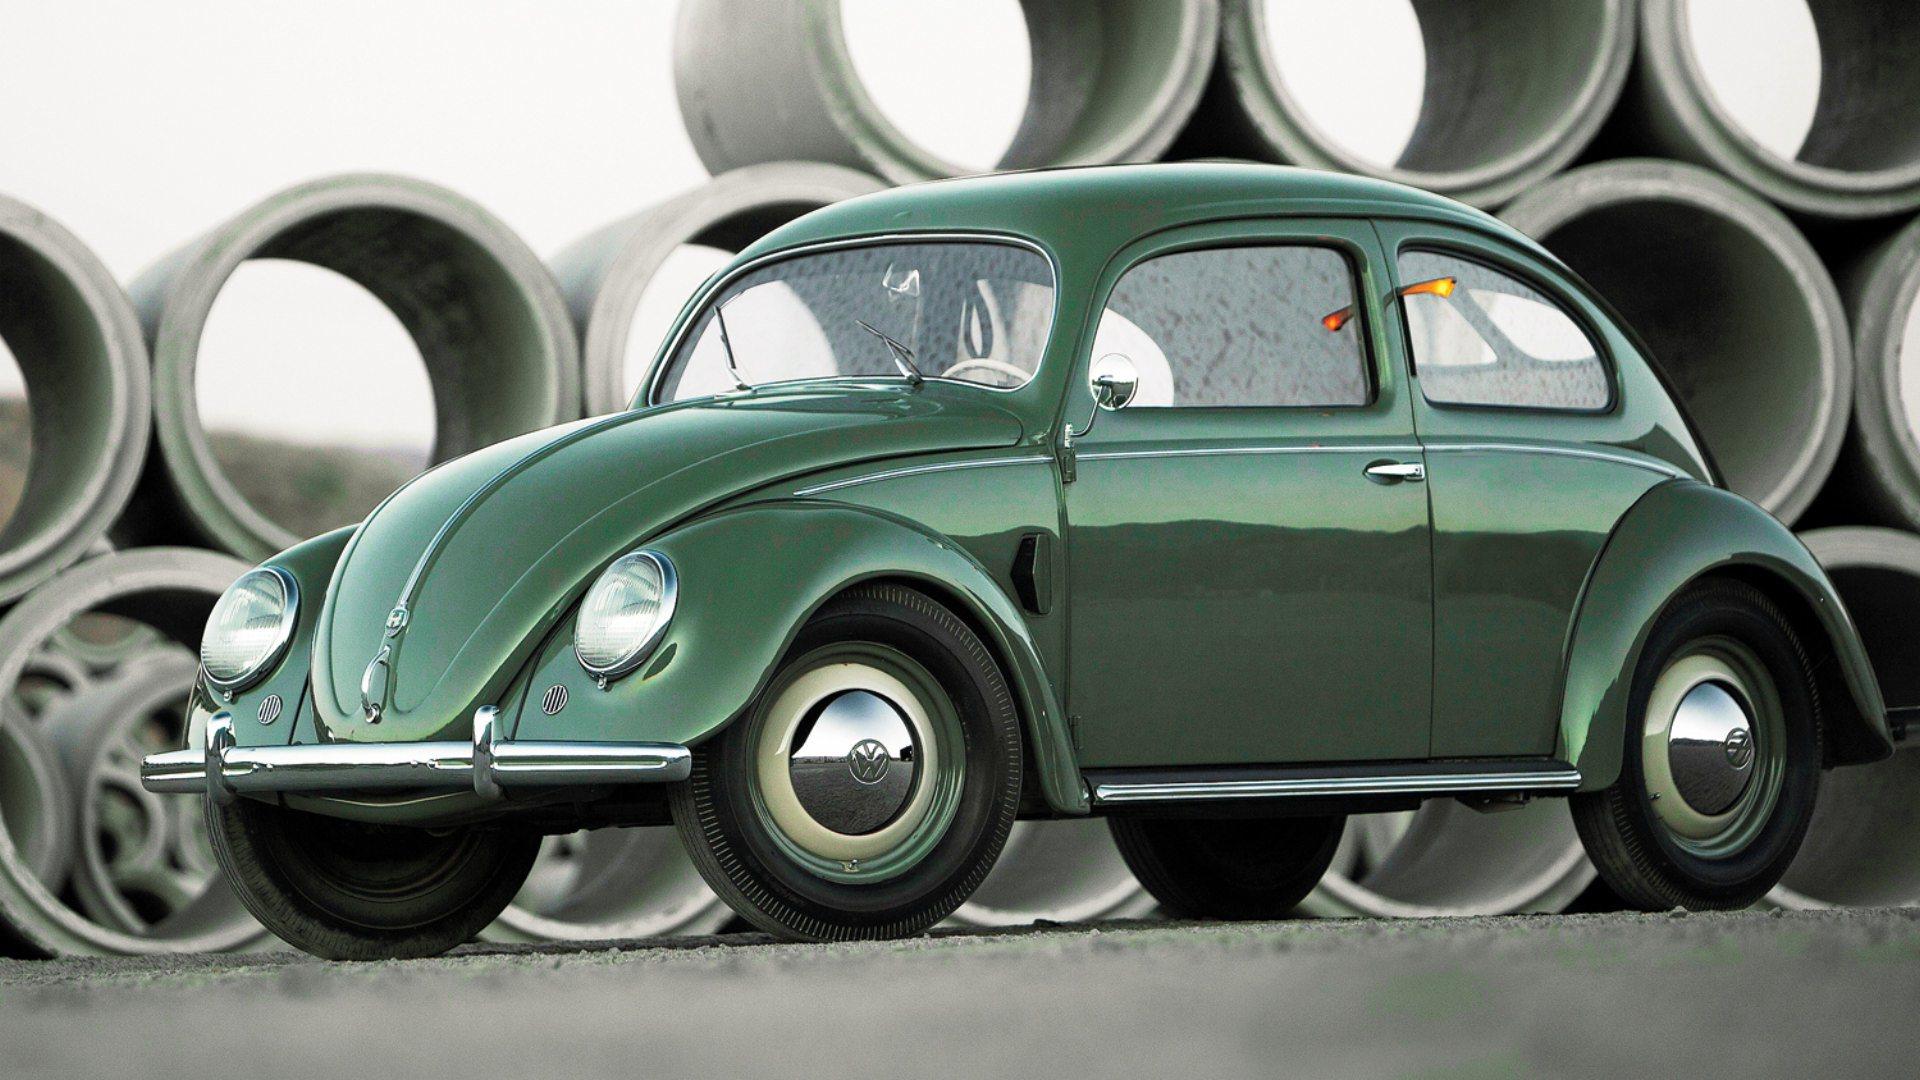 description volkswagen beetle classic is a hi res wallpaper for pc 1920x1080